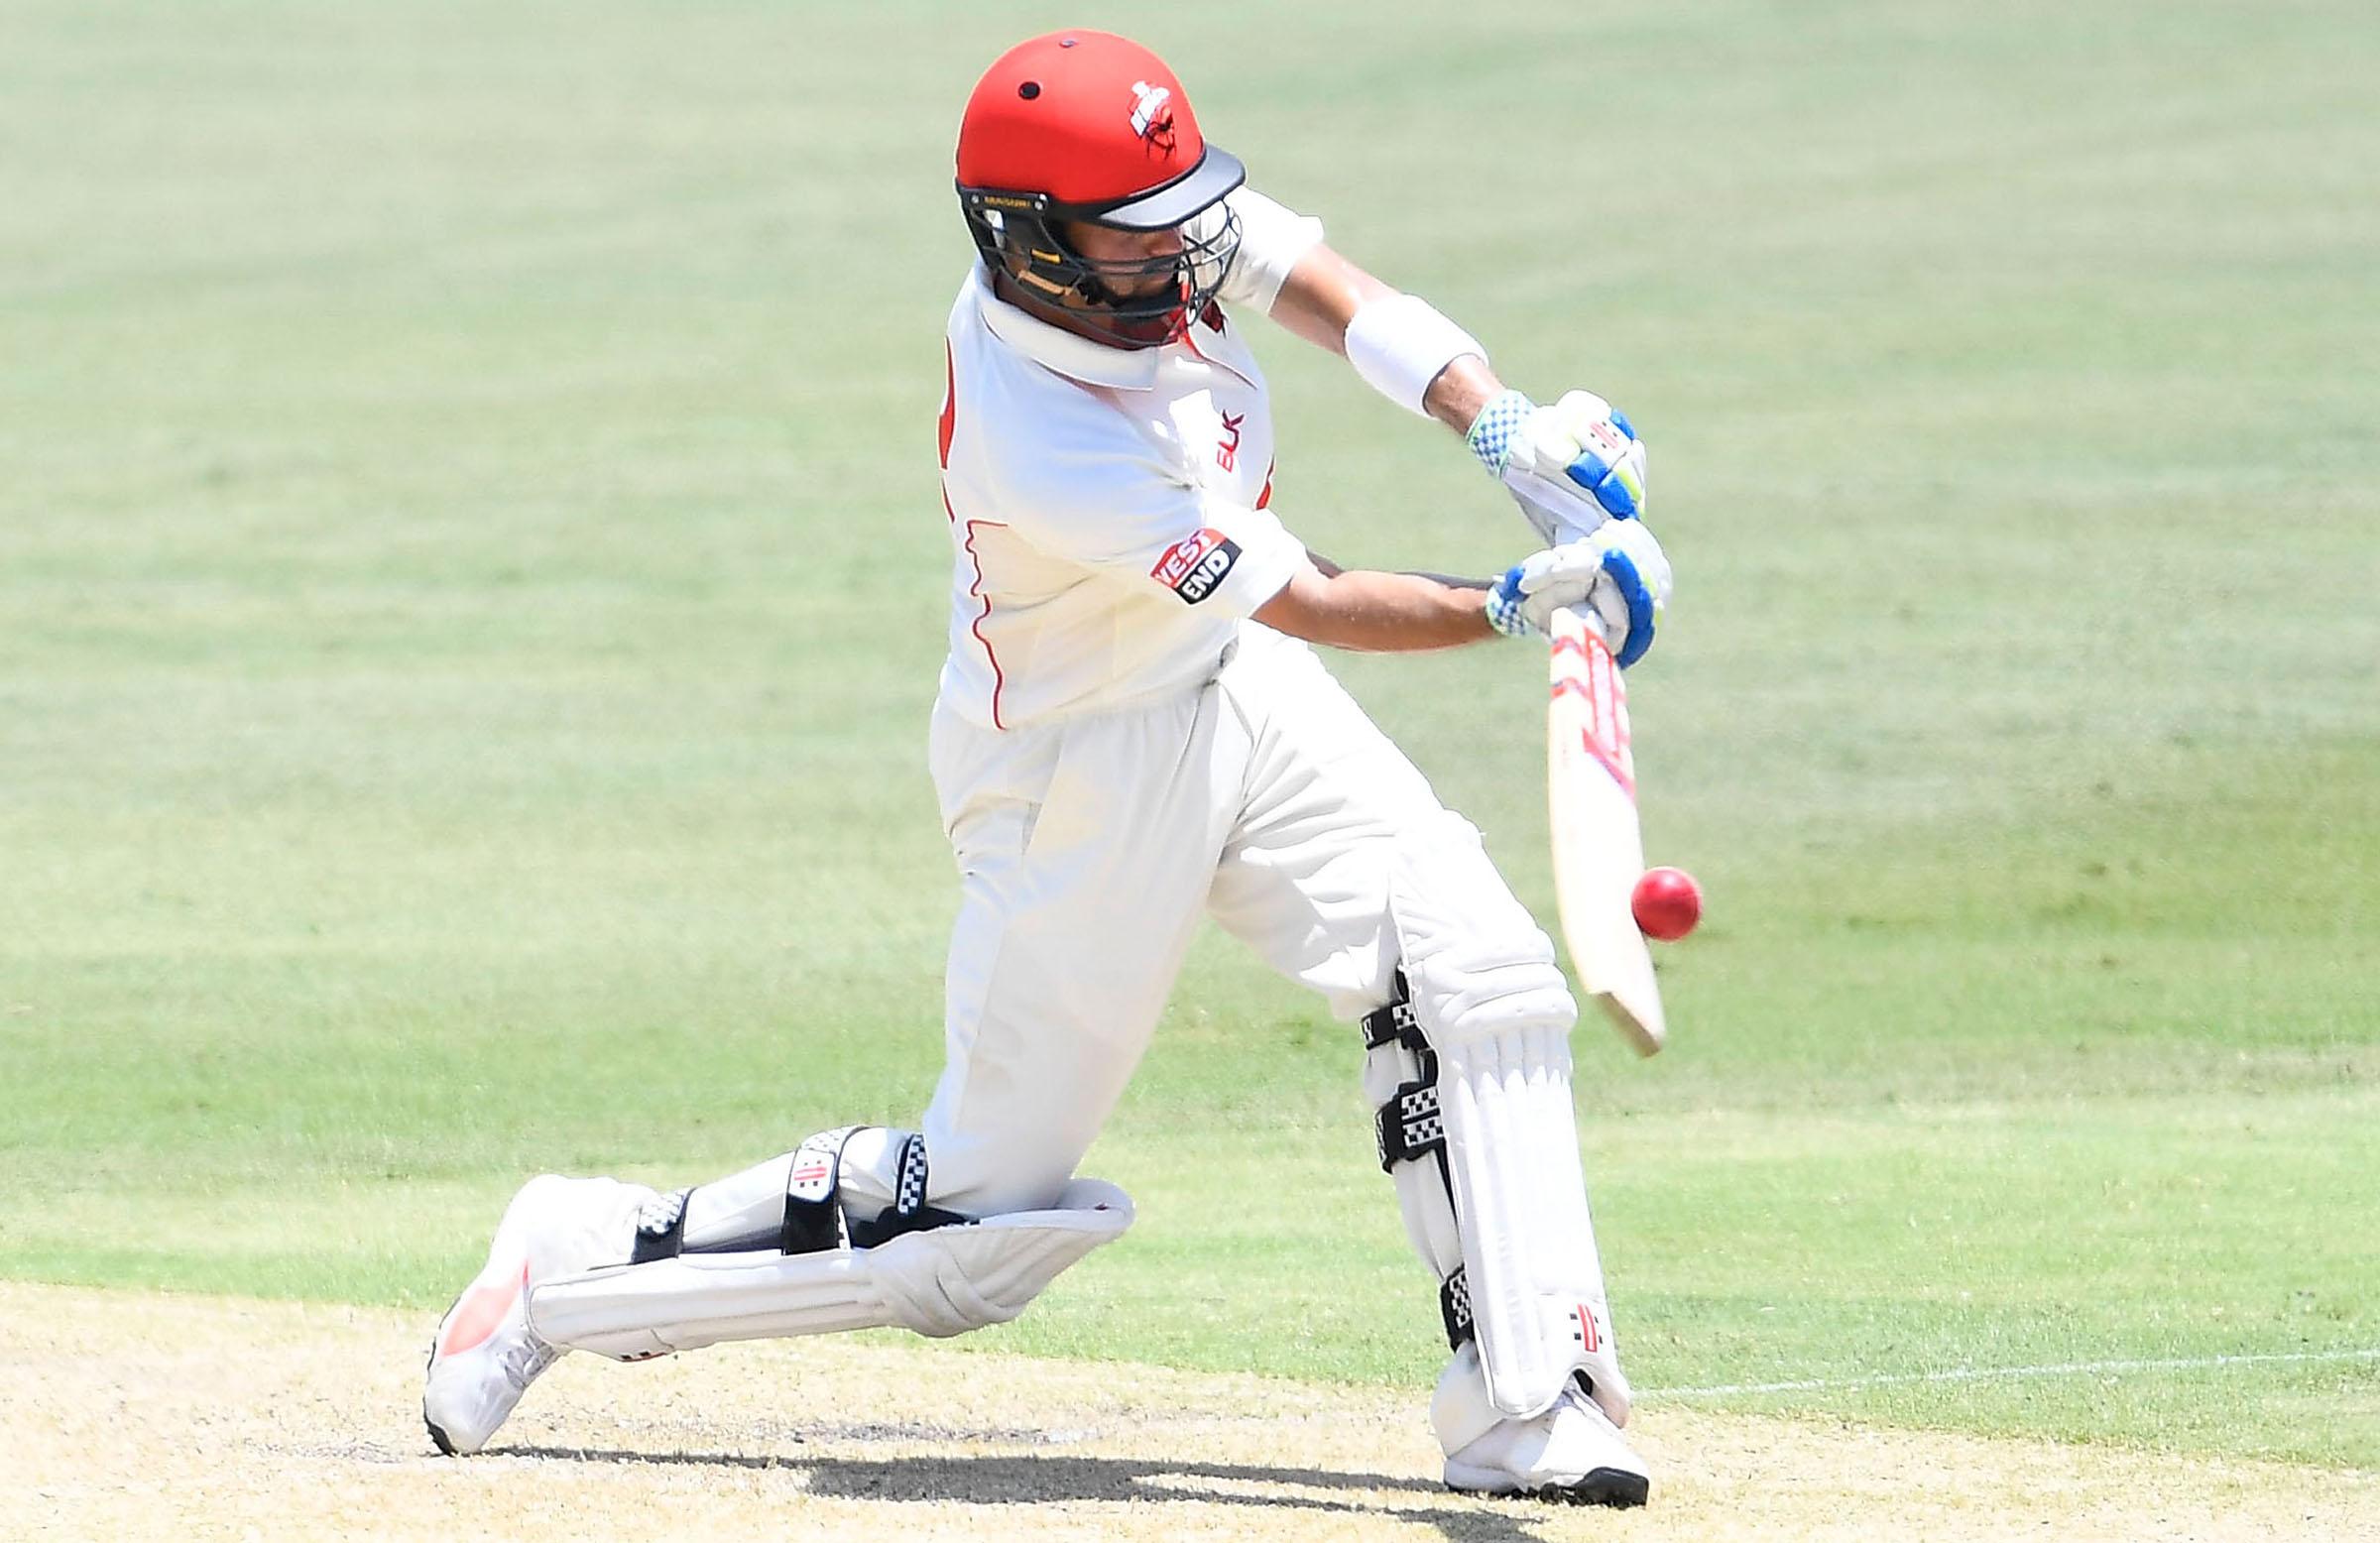 redbacks secure crucial shield win cricketcomau